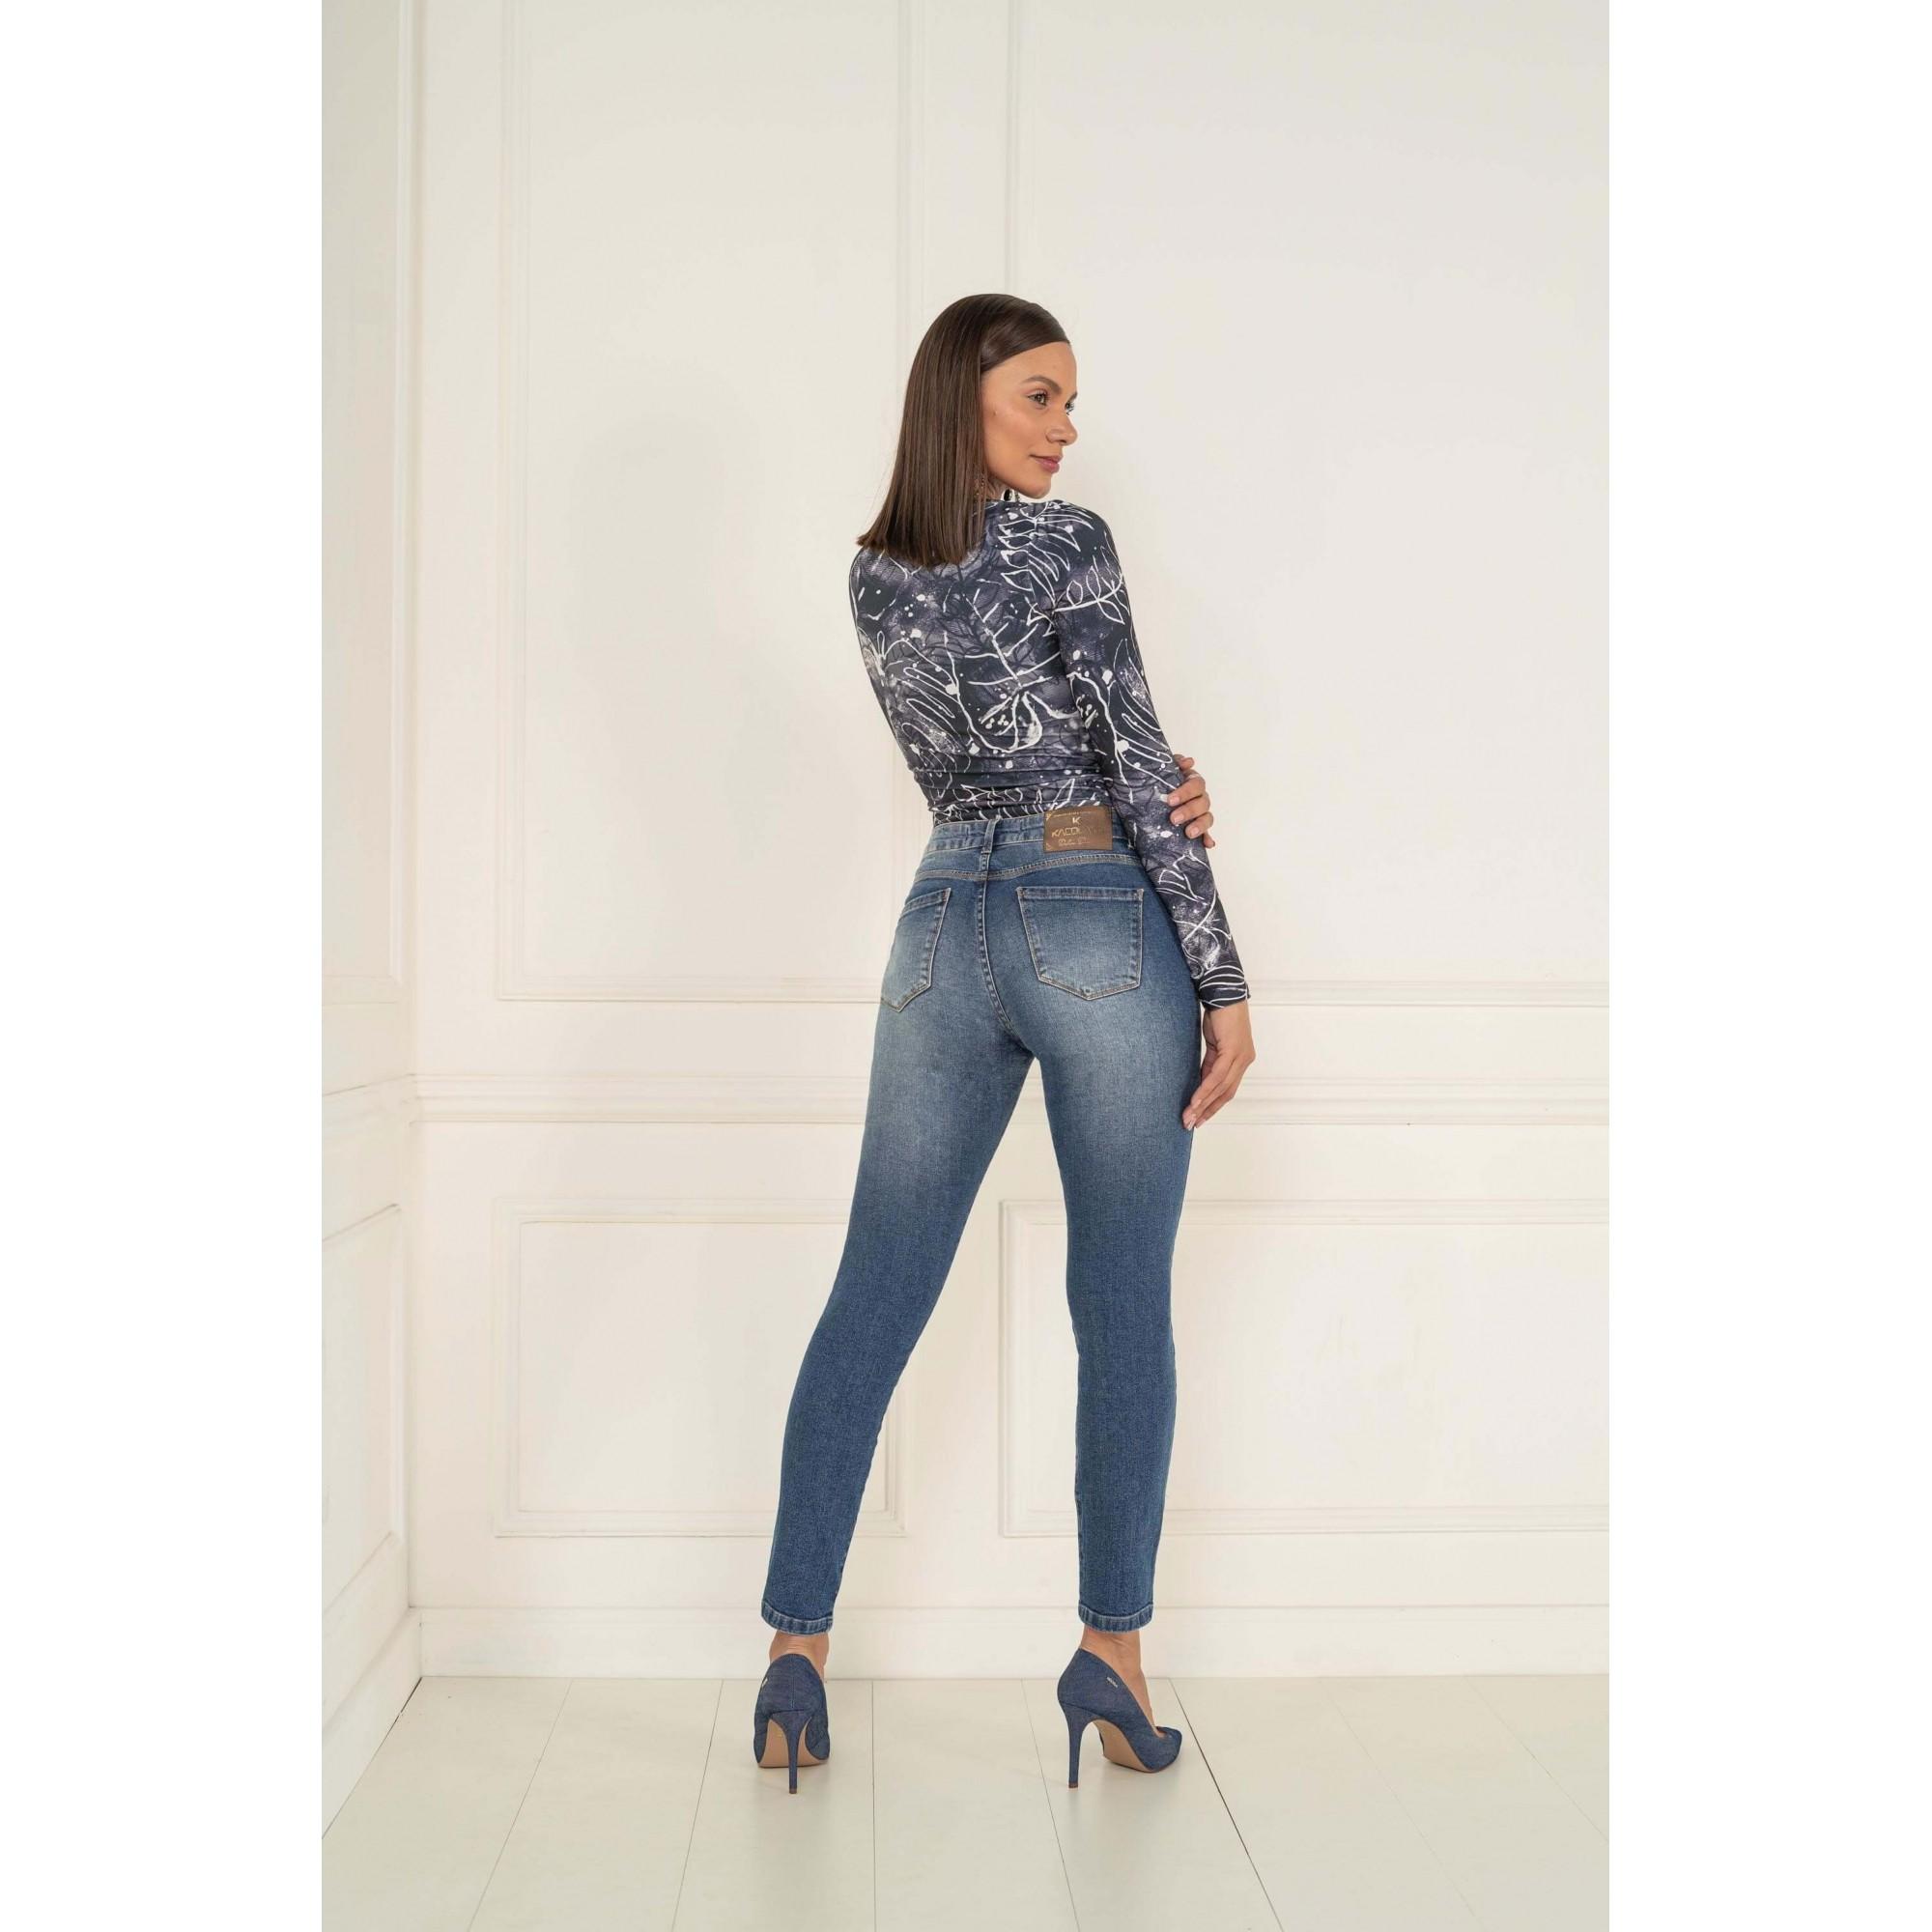 Calça Jegging Lycra Jeans Feminino K20153 - KACOLAKO